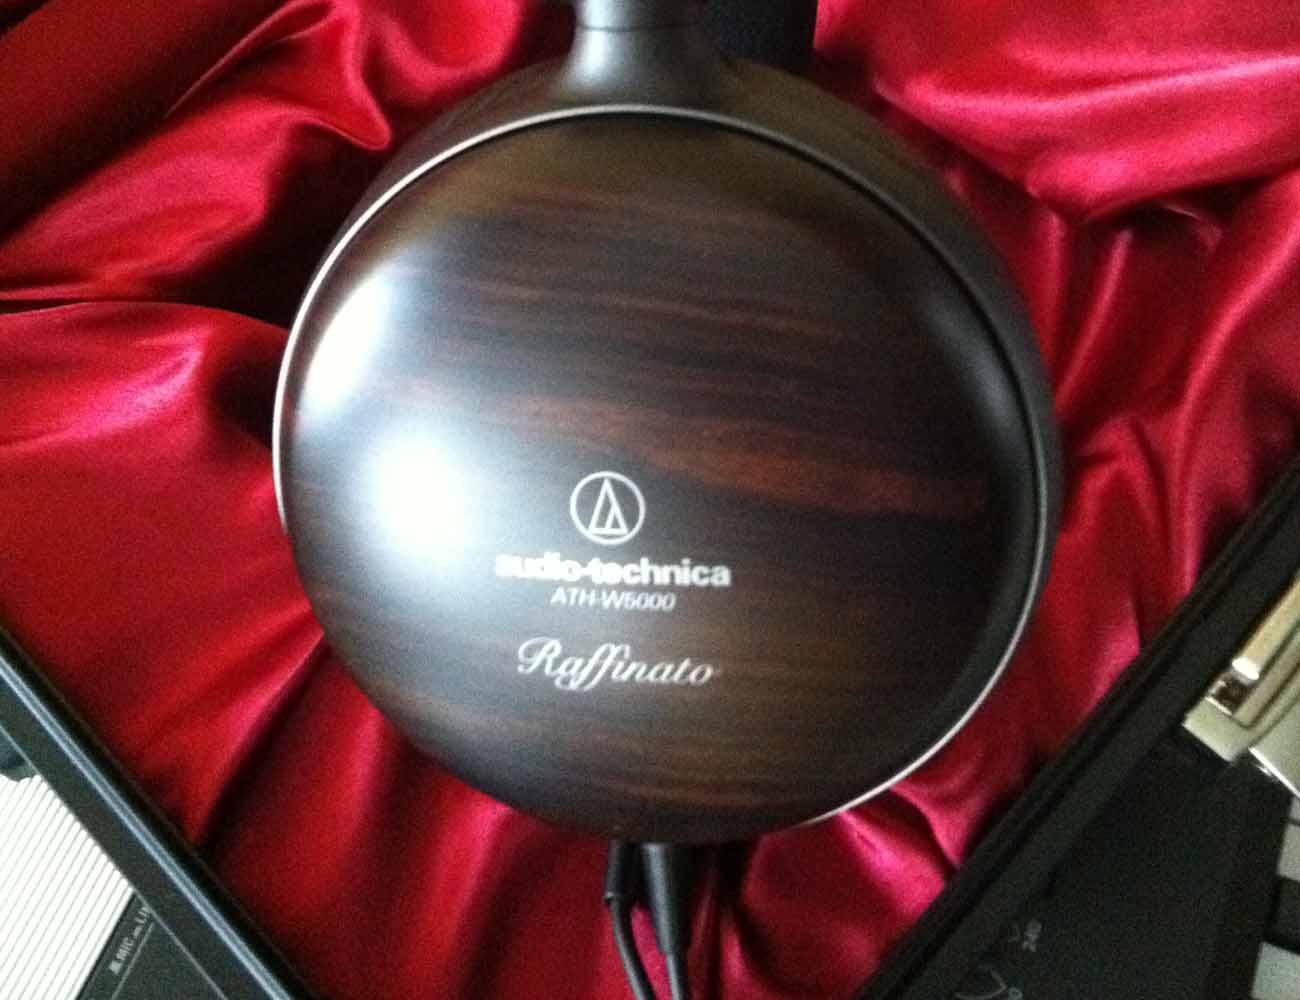 Audio-Technica ATH-W5000 Audiophile Headphones